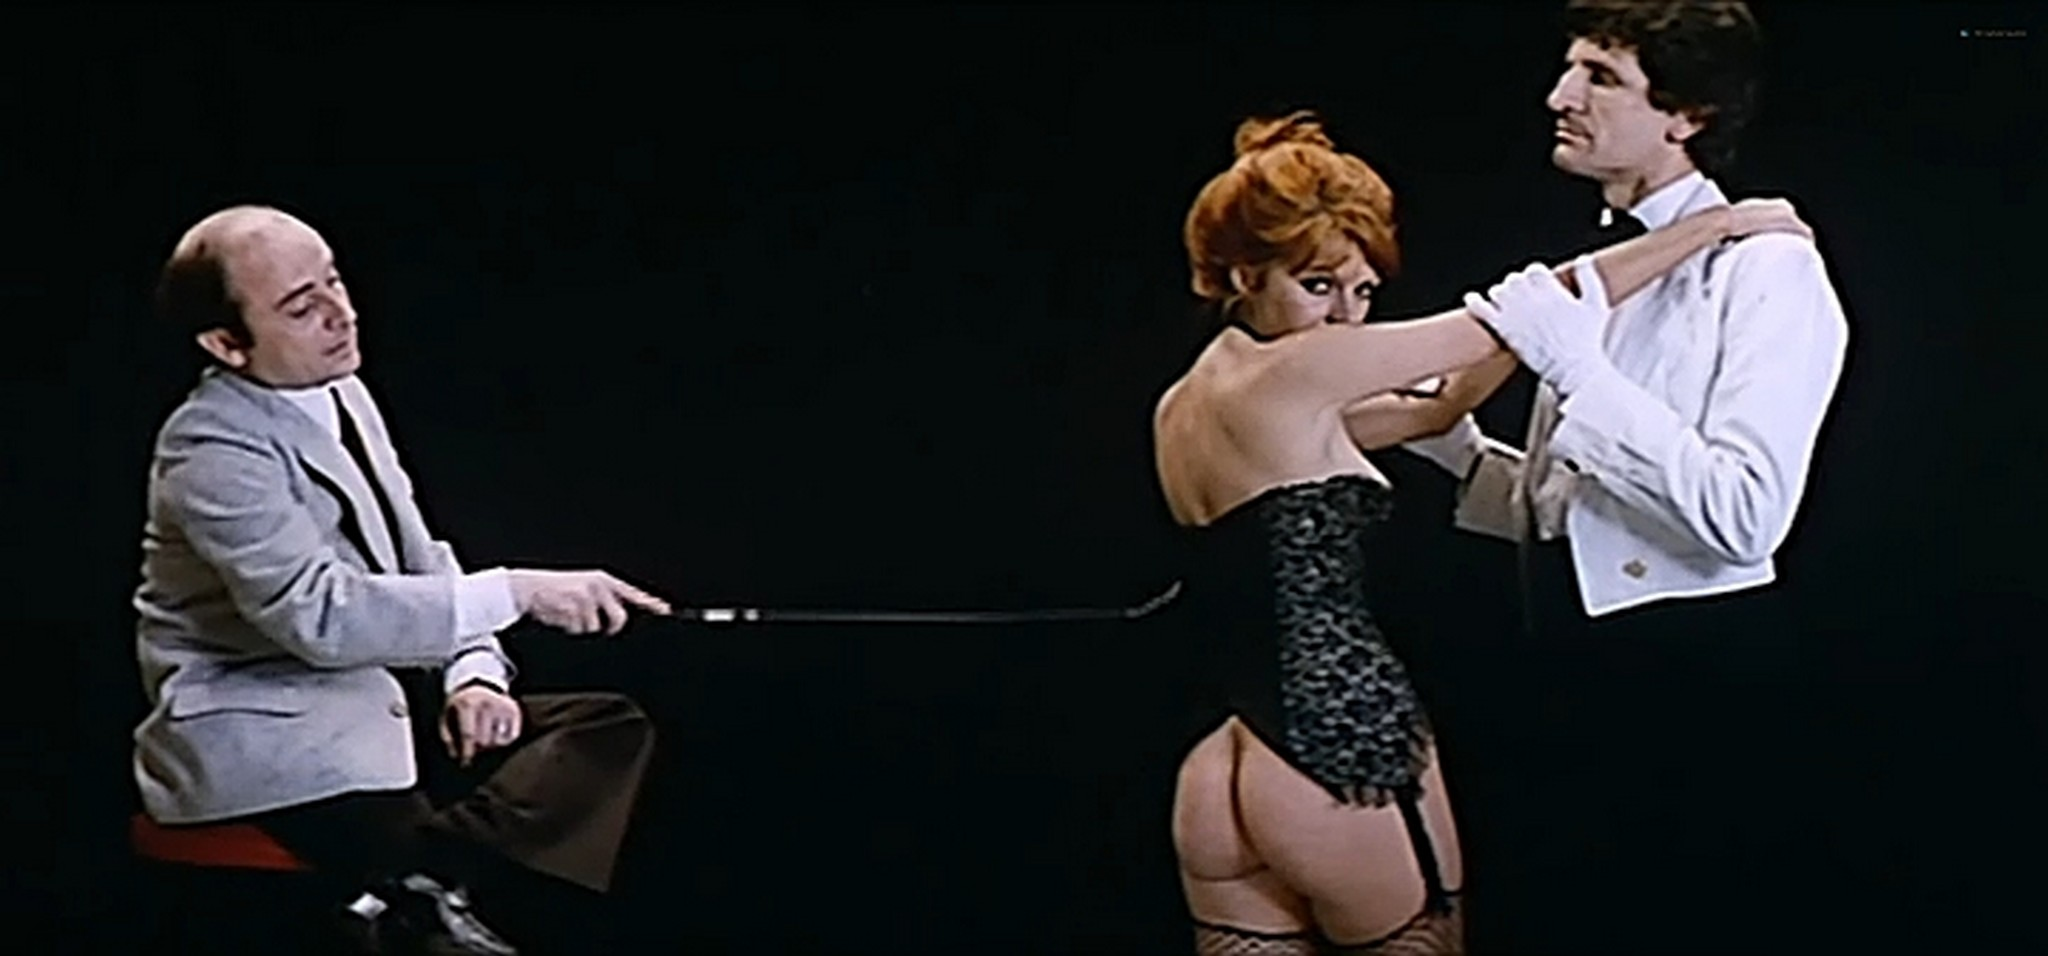 Anicee Alvina nude full frontal Sylvia Kristel and others nude Le jeu avec le feu FR 1975 DVDrip 6